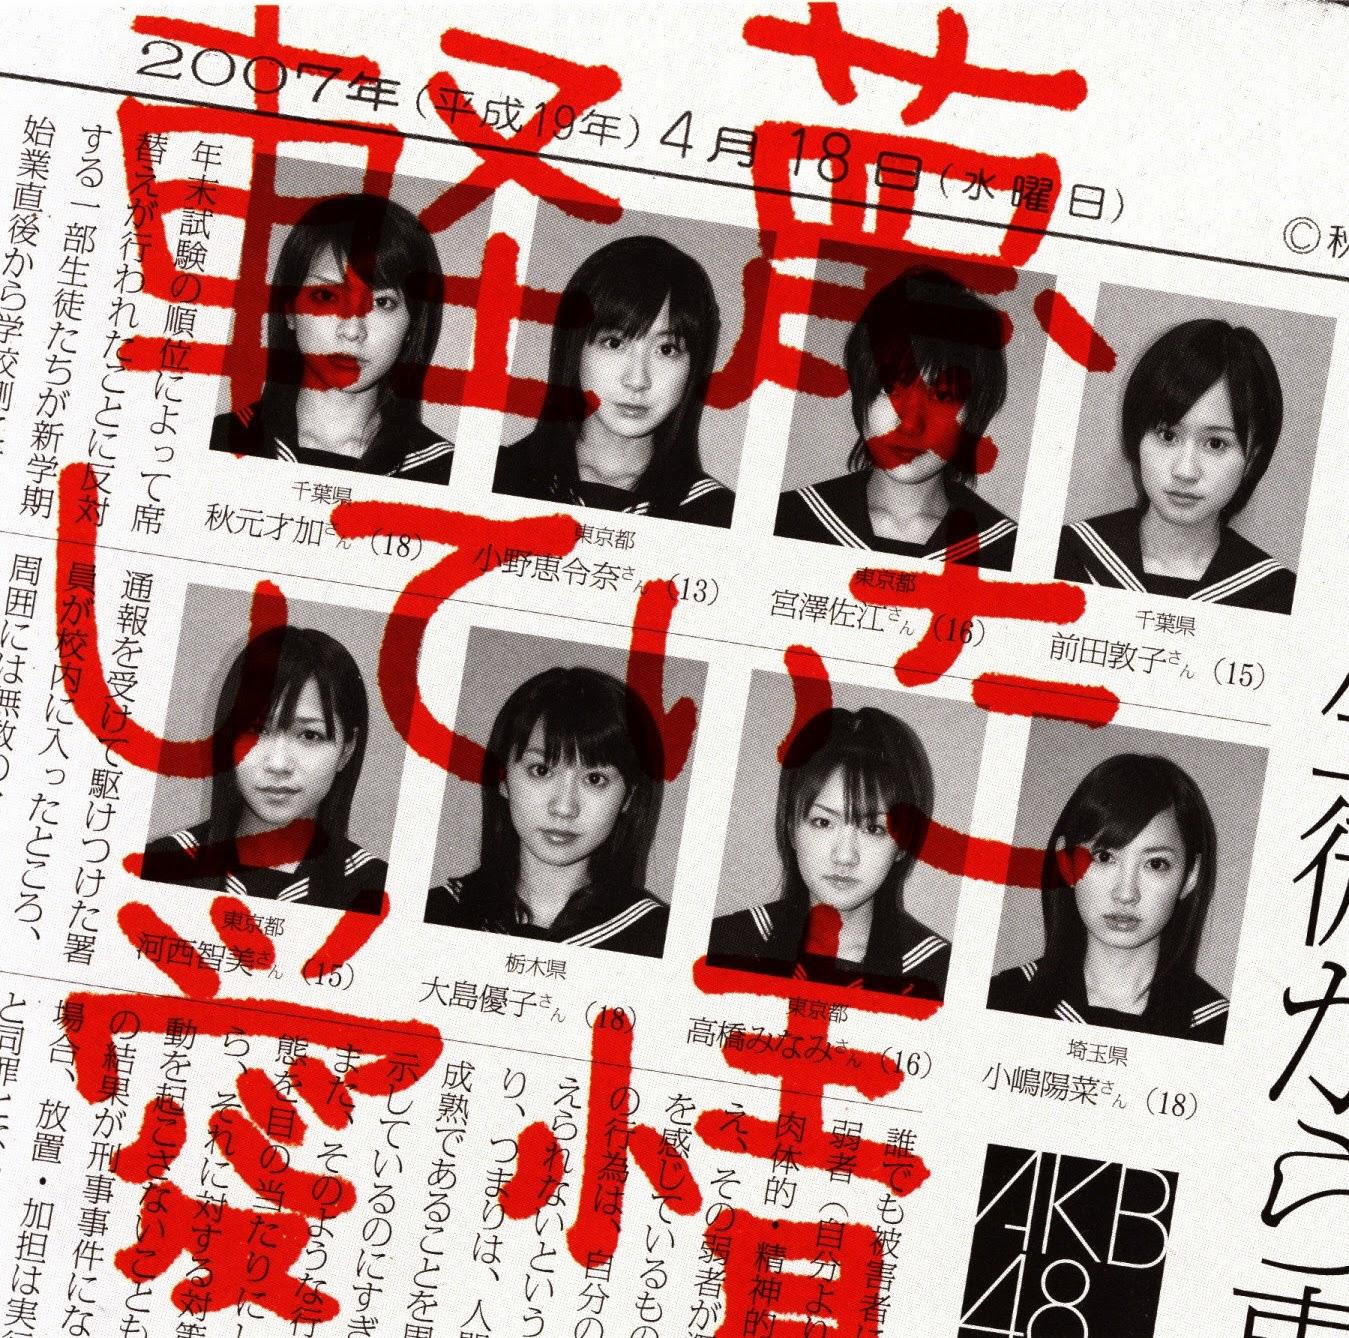 3rd Single AKB48  軽蔑していた愛情 (Keibetsu Shiteita Aijou)